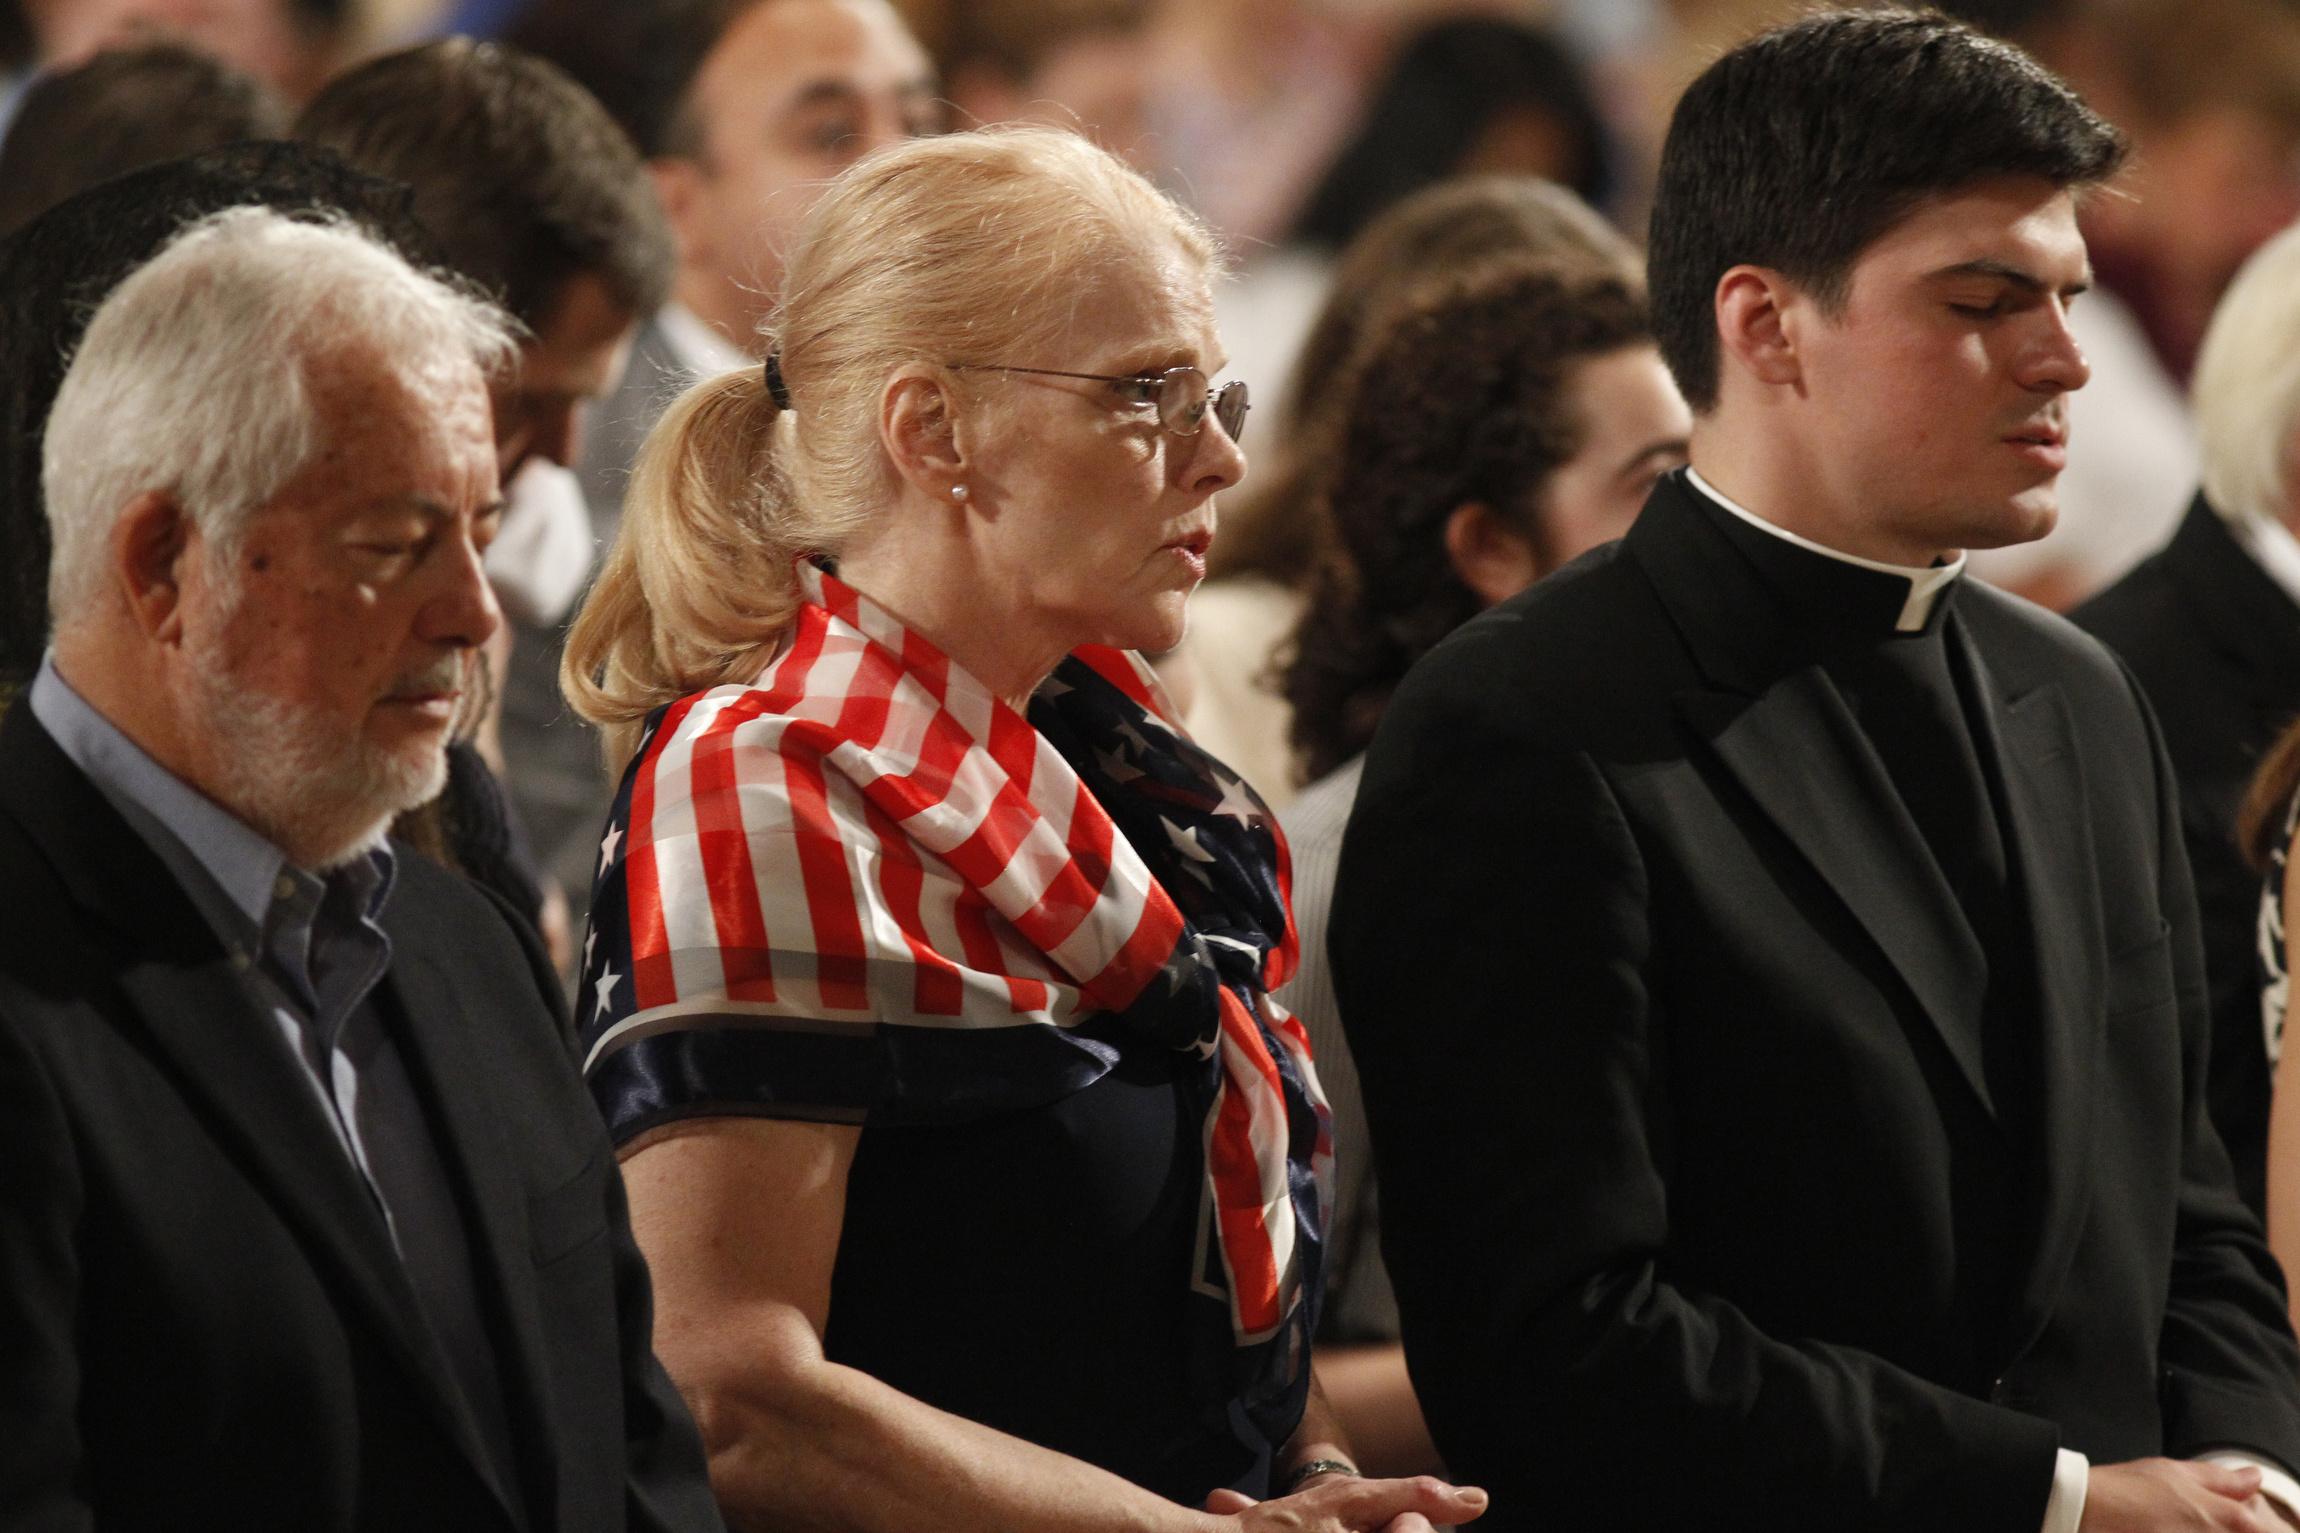 Mark u s church s fortnight for freedom catholic philly